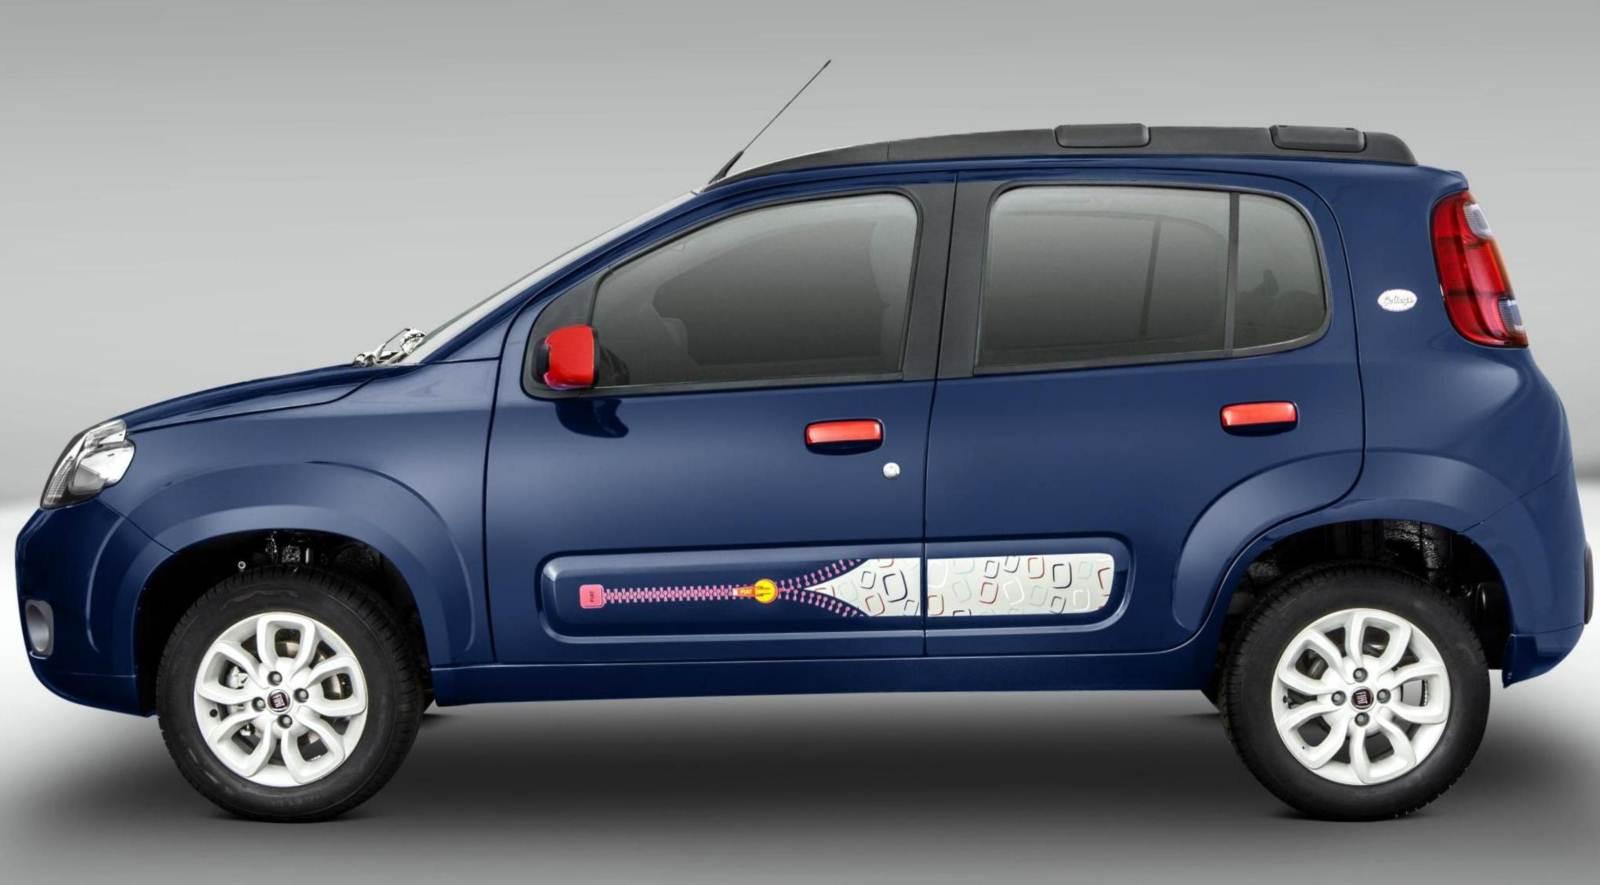 Novo uno adventure 2013 ficha autos weblog for Fiat adventure 2016 ficha tecnica